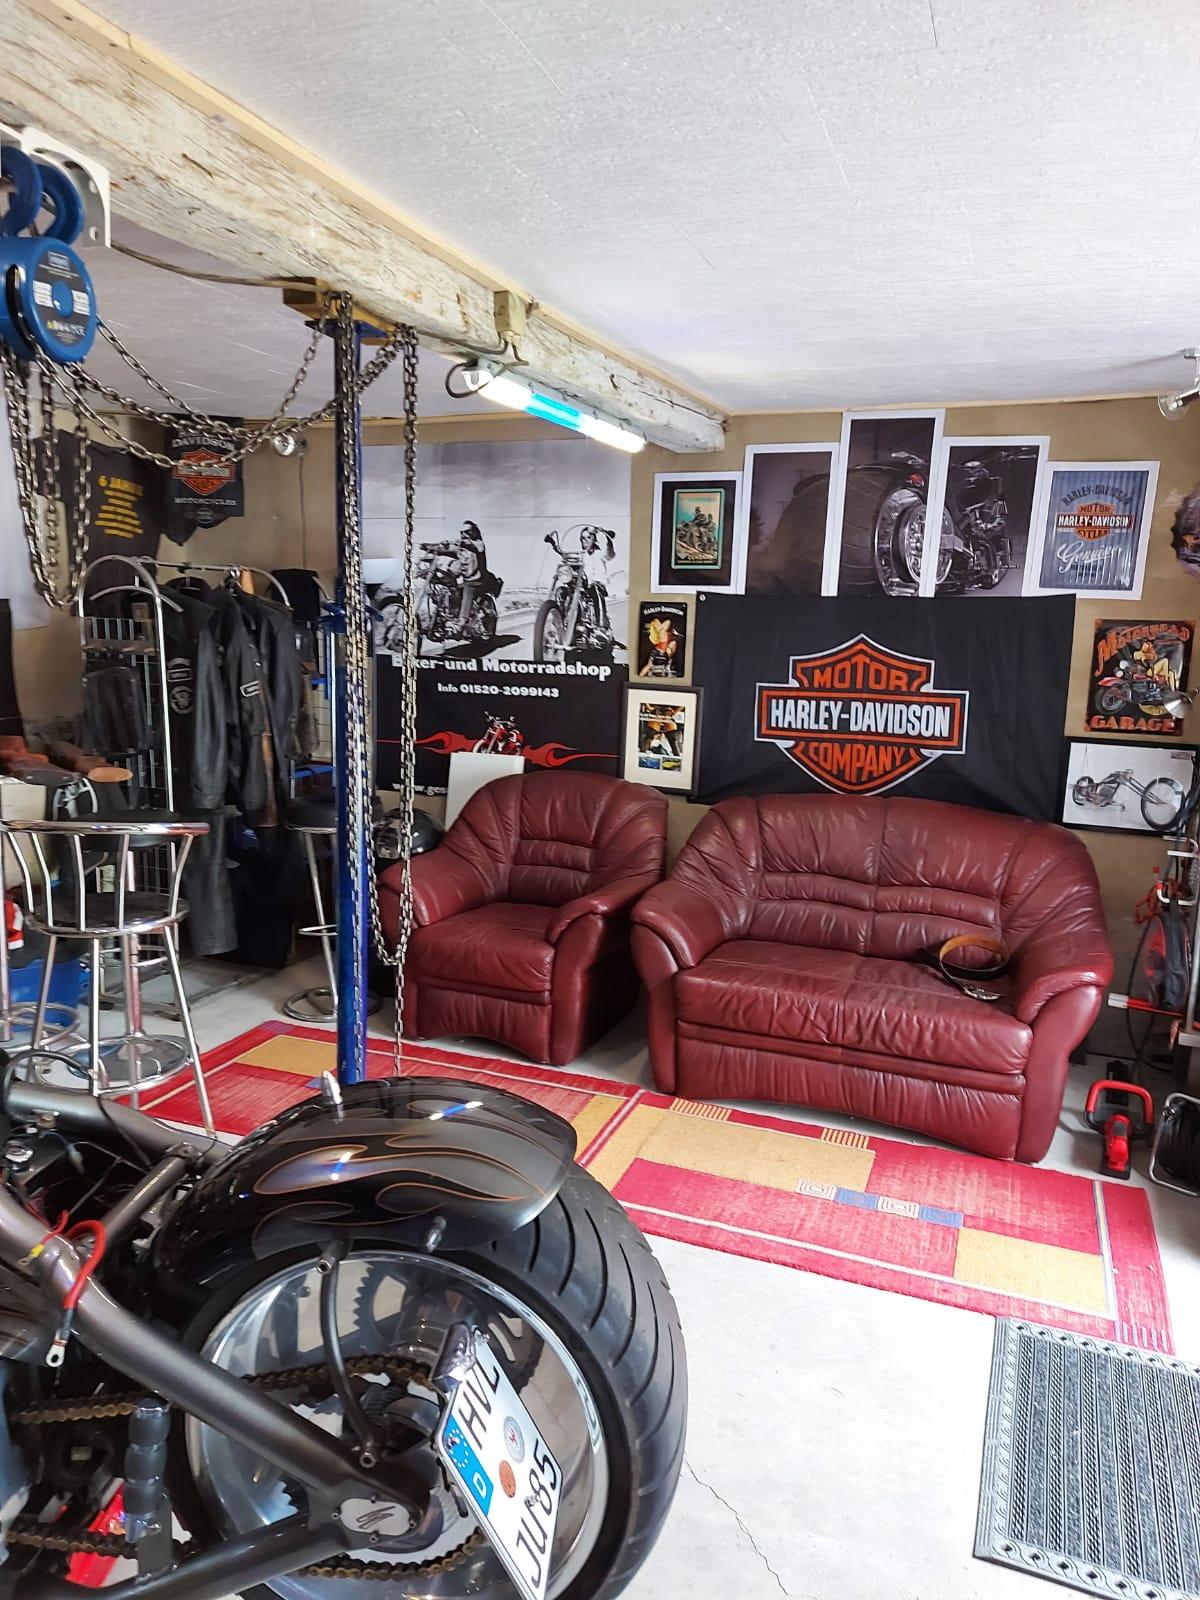 biker_shop_2021_05_25 (2)